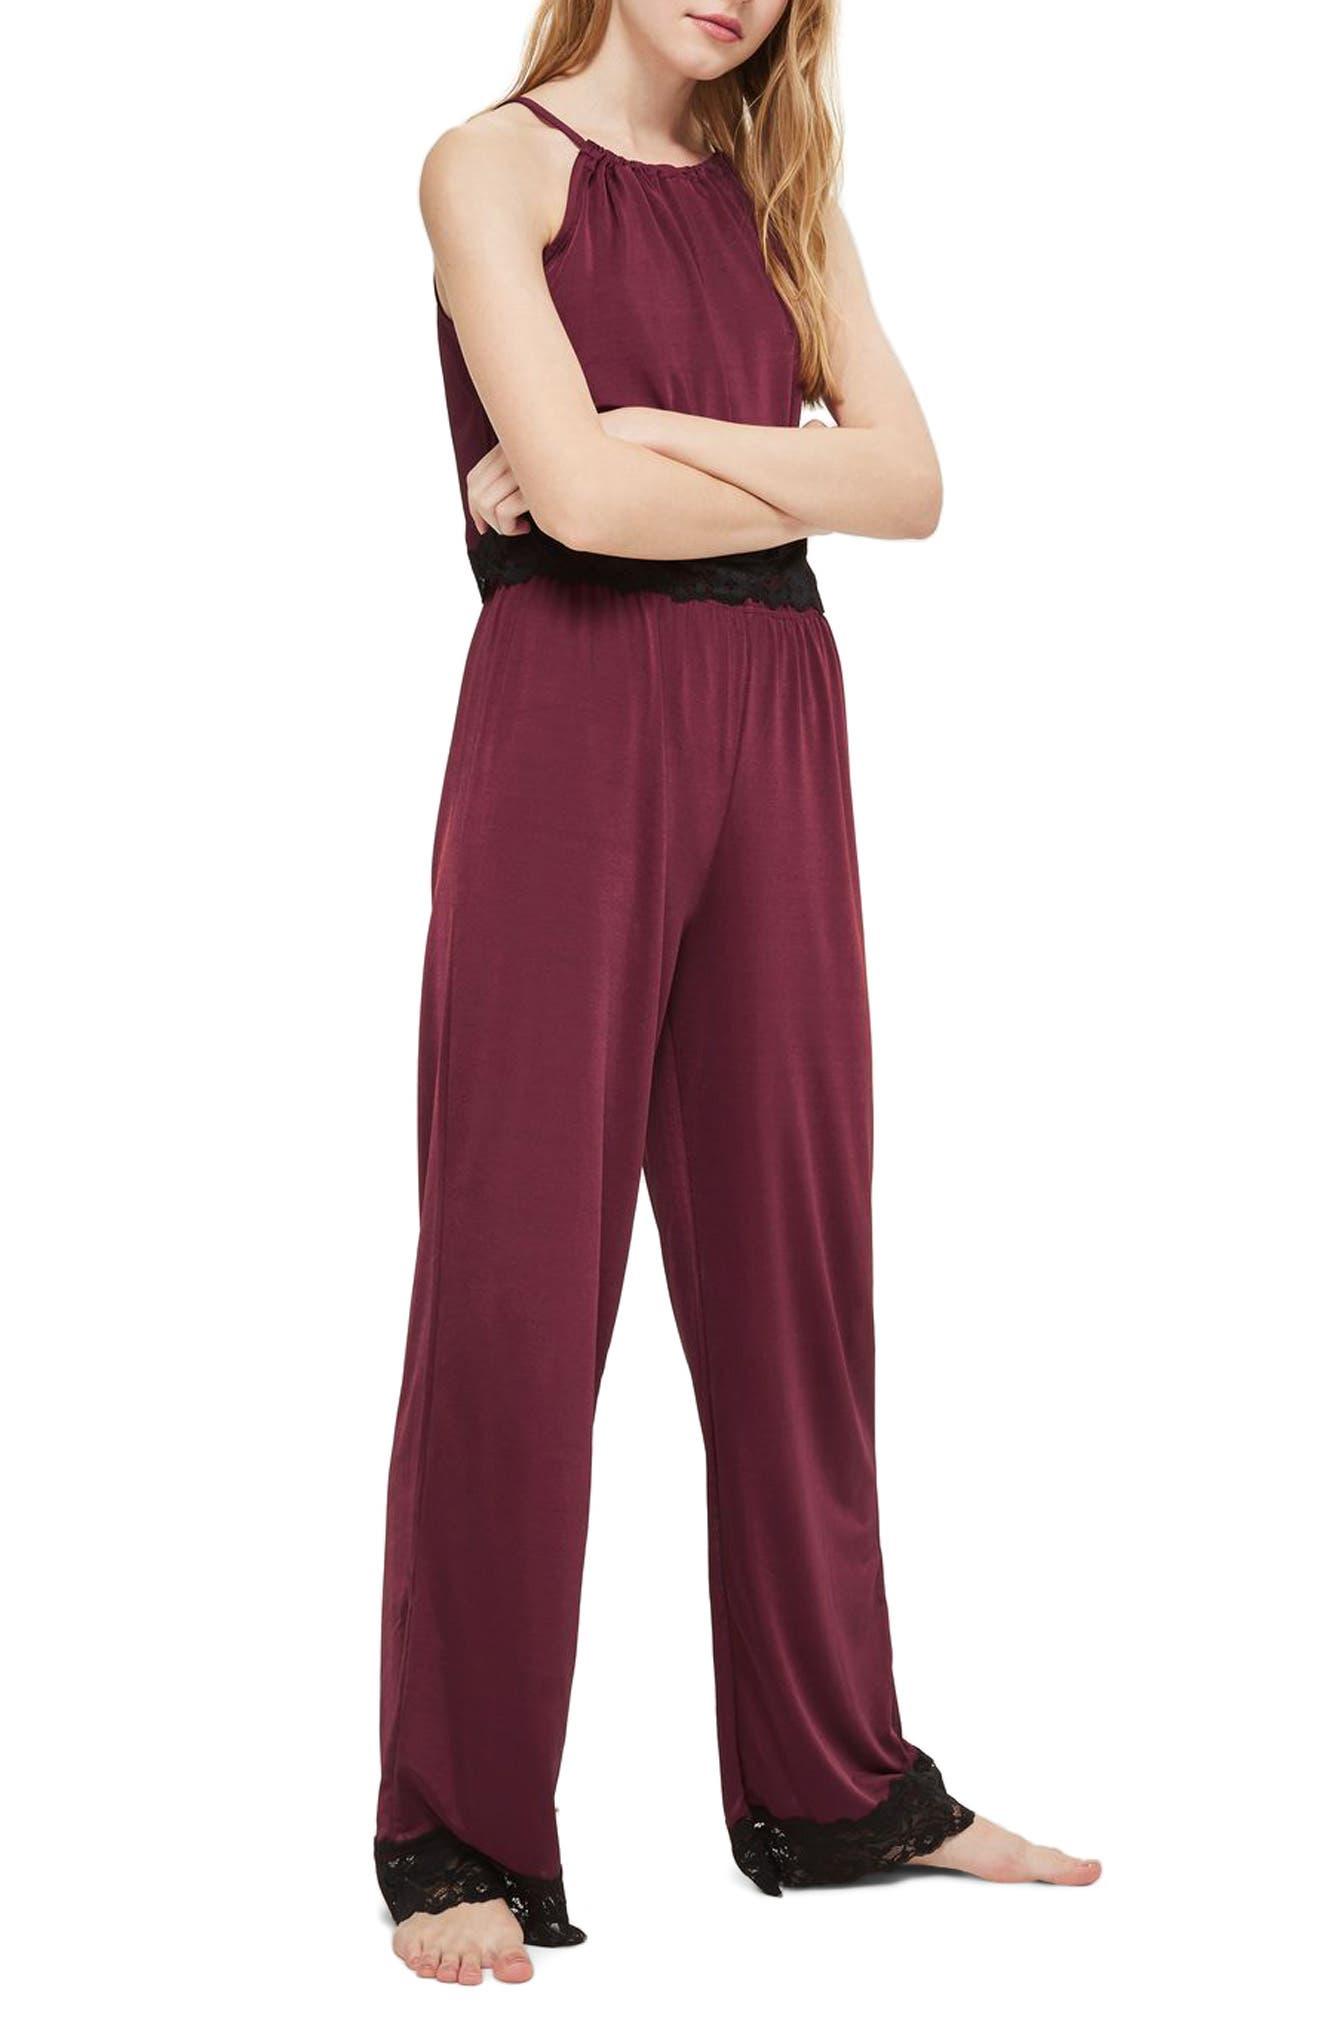 Alternate Image 1 Selected - Topshop Jersey Satin & Lace Pajama Pants